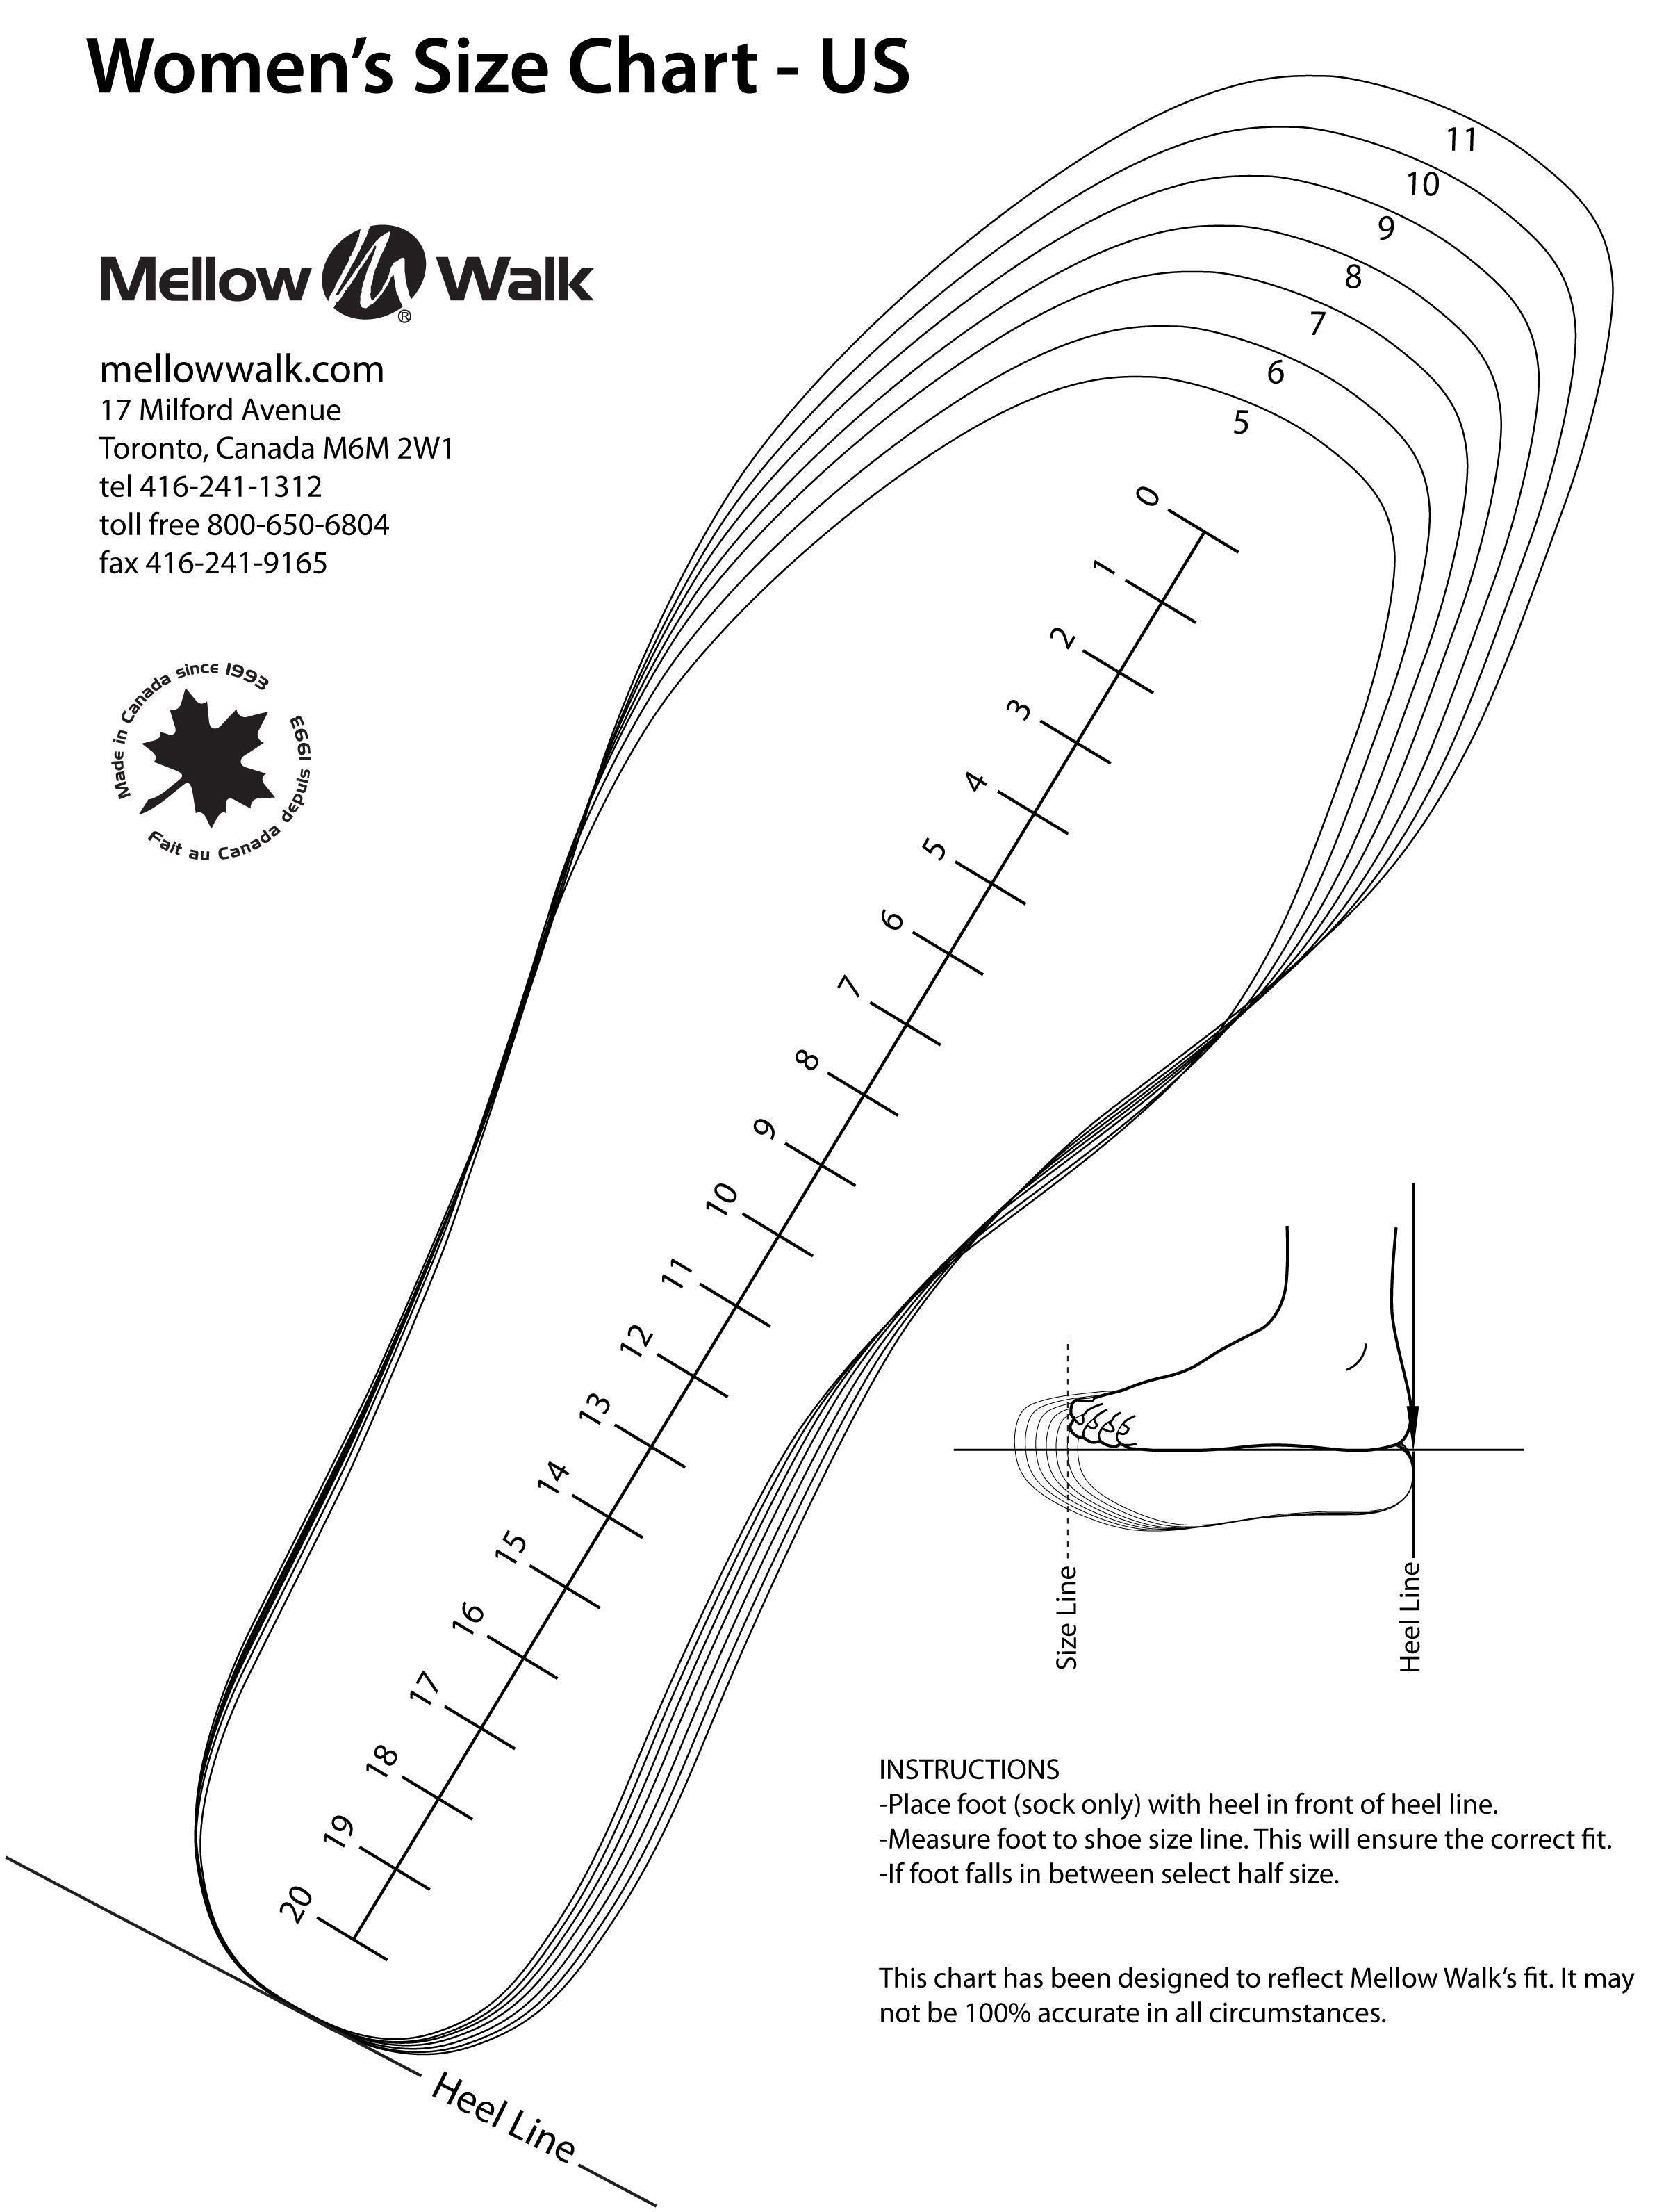 Comprehensive image within printable size chart